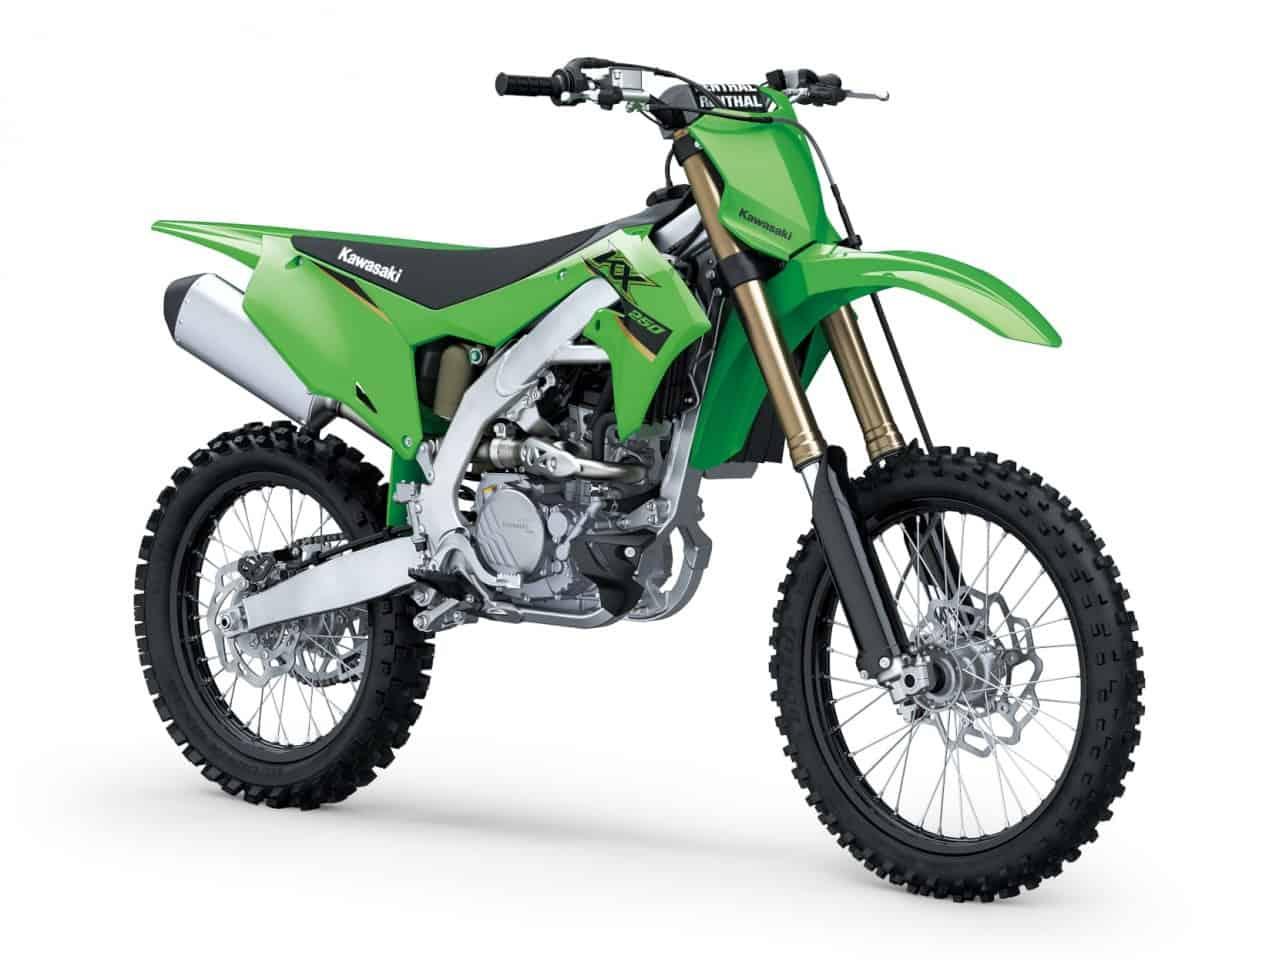 Kawasaki KX250 Modelljahrgang 2022